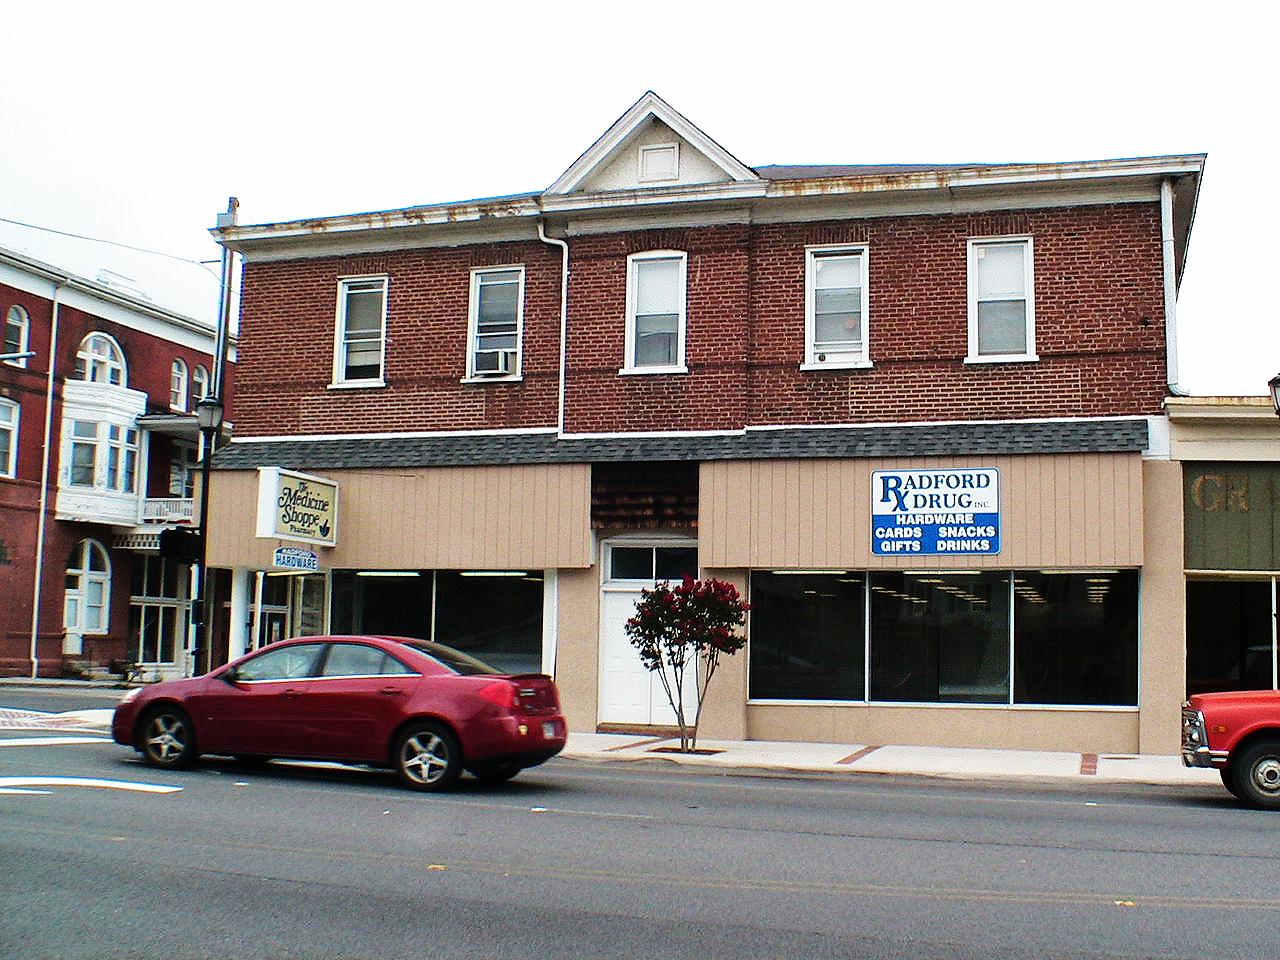 Tony_Ward_Studio_old_court_house_Radford_Virginia_main_street